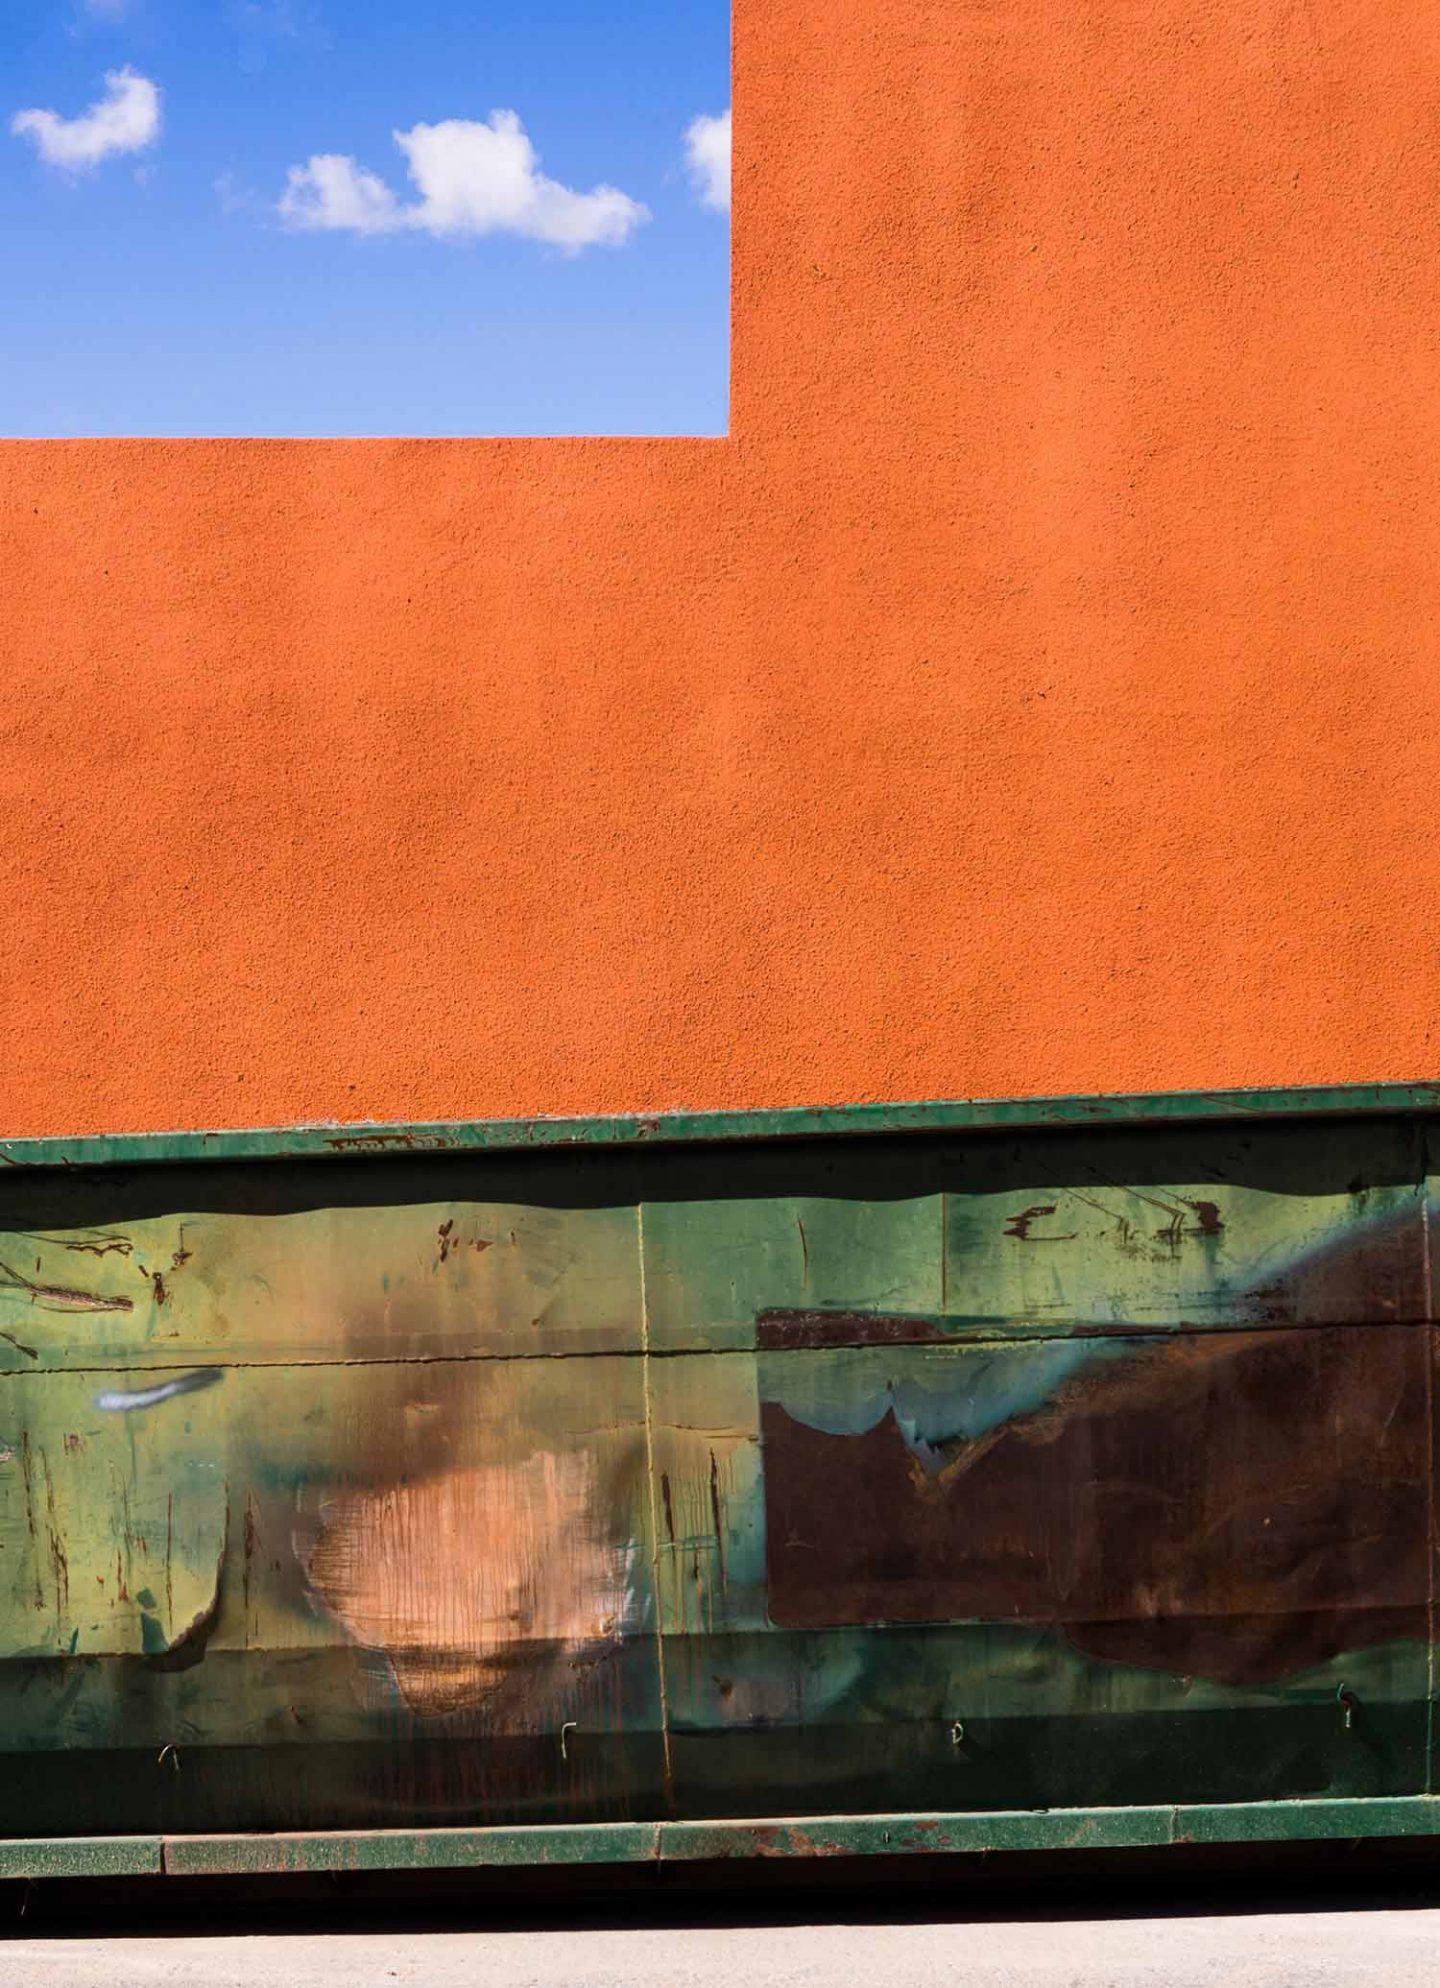 Ignant-ContainerofDreams-NatalieChristensen